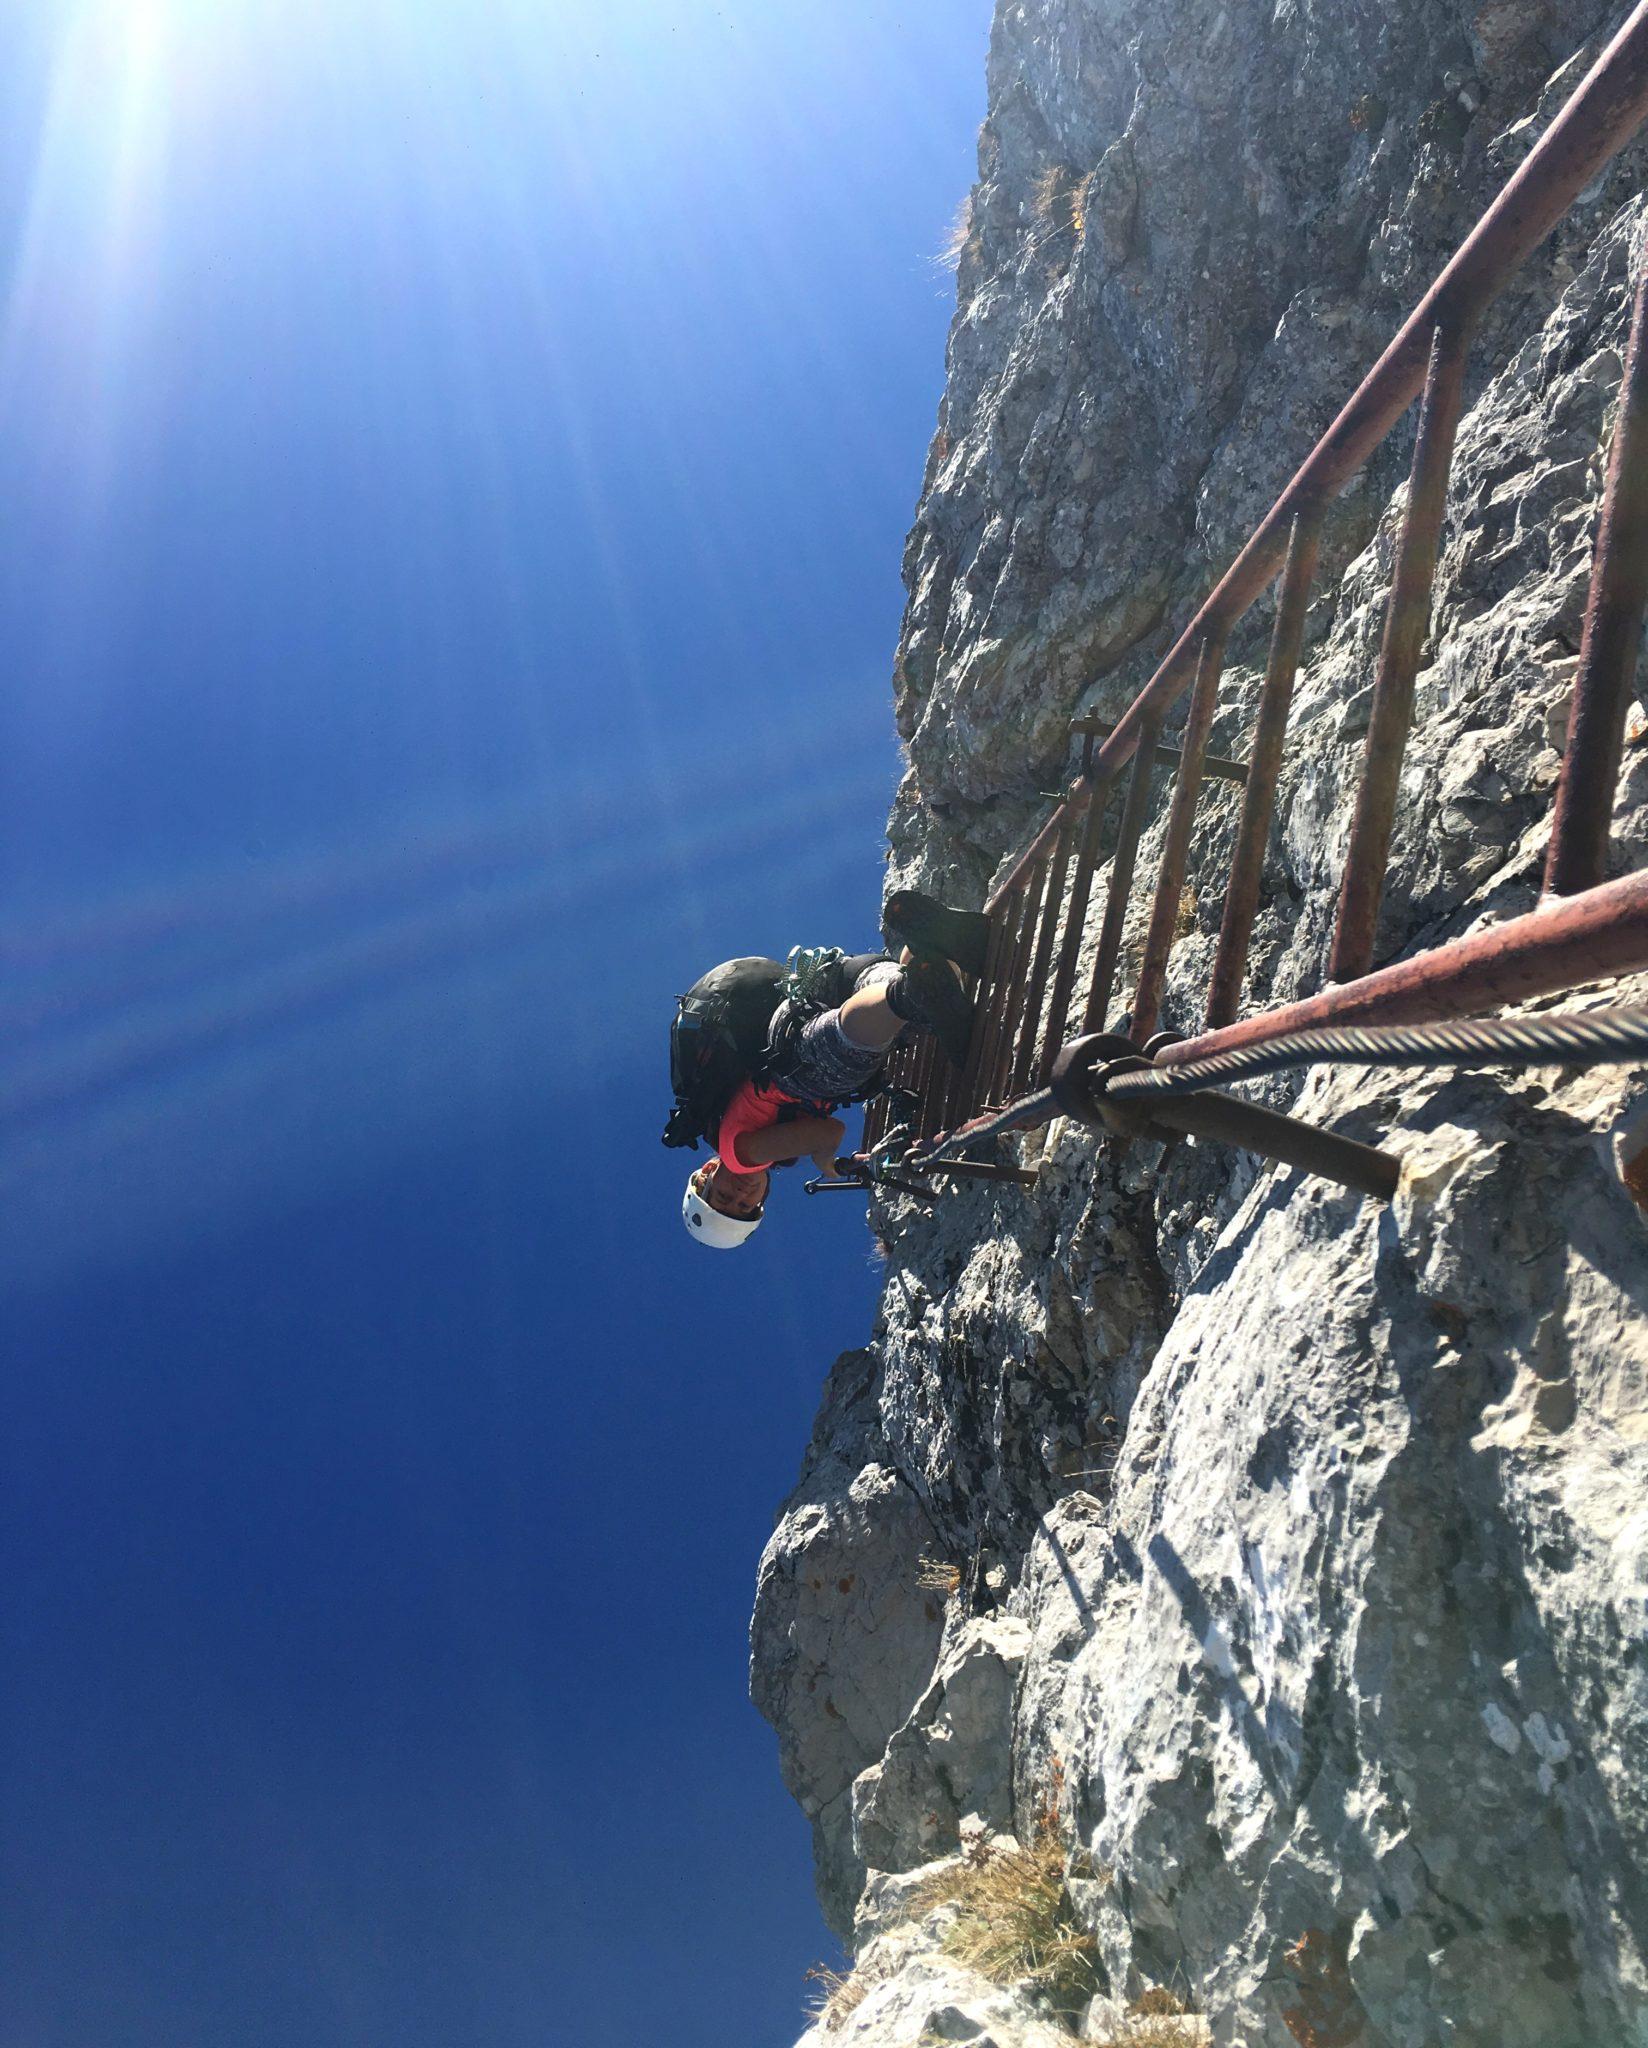 Climbing a via ferrata in Slovenia